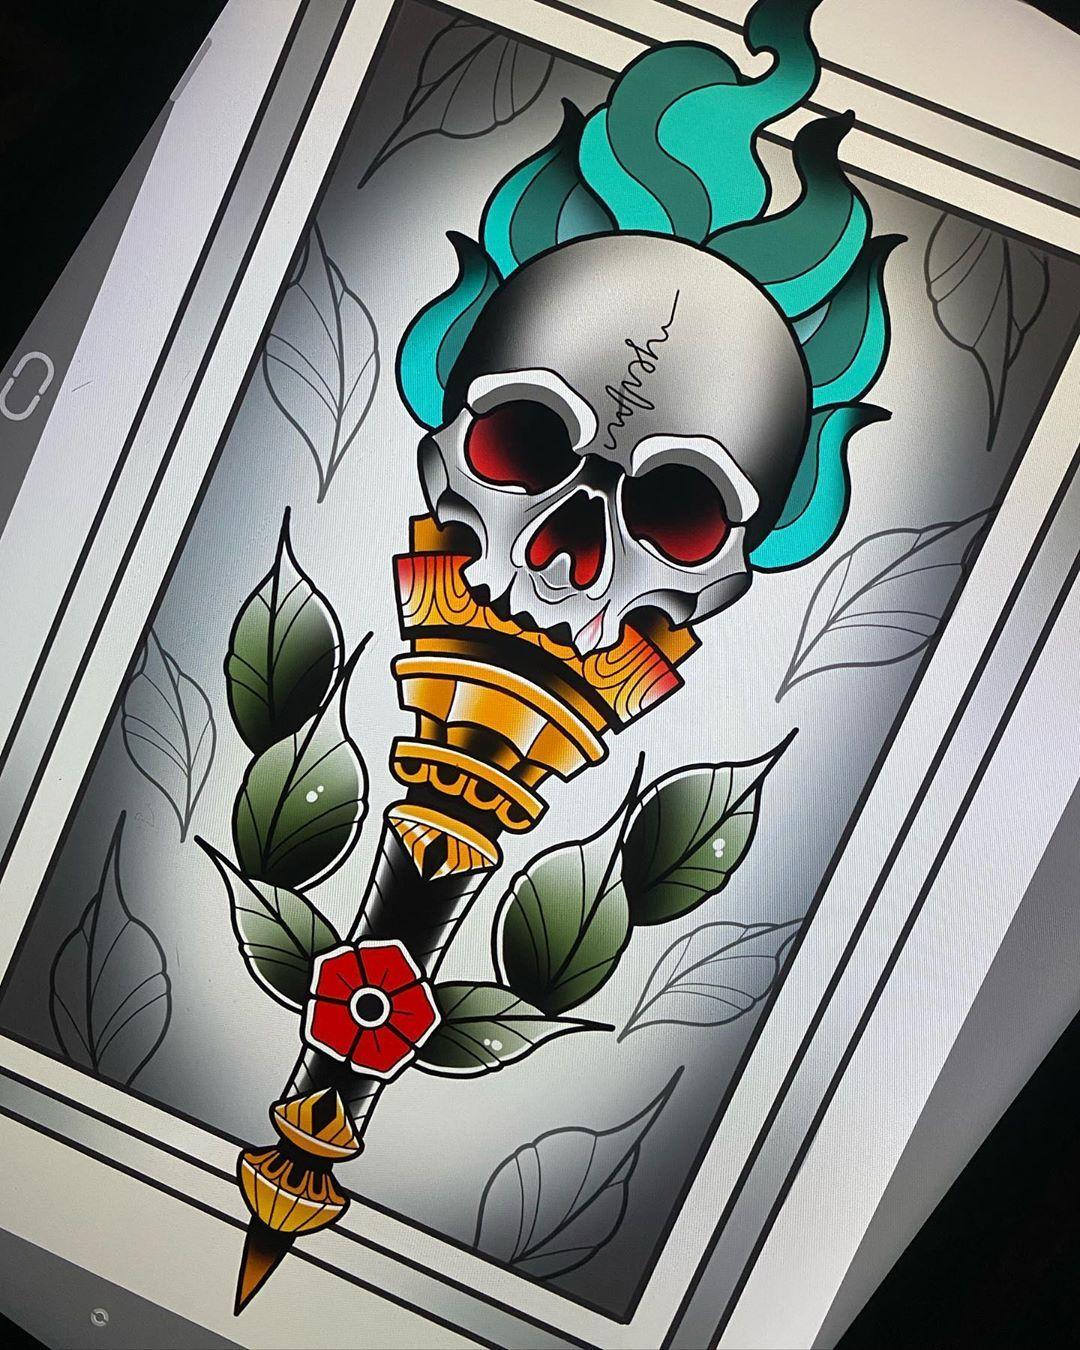 Con ganas del volver @darumatattoos #topclasstattooing #solidtattoo #realtattoos #tattooartwork #traditionaLtattoo #tattoocollectors #bcnttt #tattooartist #besttradtattoos  #tattooworkers #tattoospain #oldlines #real_traditional_flash #bright_and_bold #tattooflash #traditional_tattoo_spain #boldtattoos  #skinart_traditional #traditionaItattoosworldwide #barcelona #bcn #traditionaItattoos #traditionaItattoo